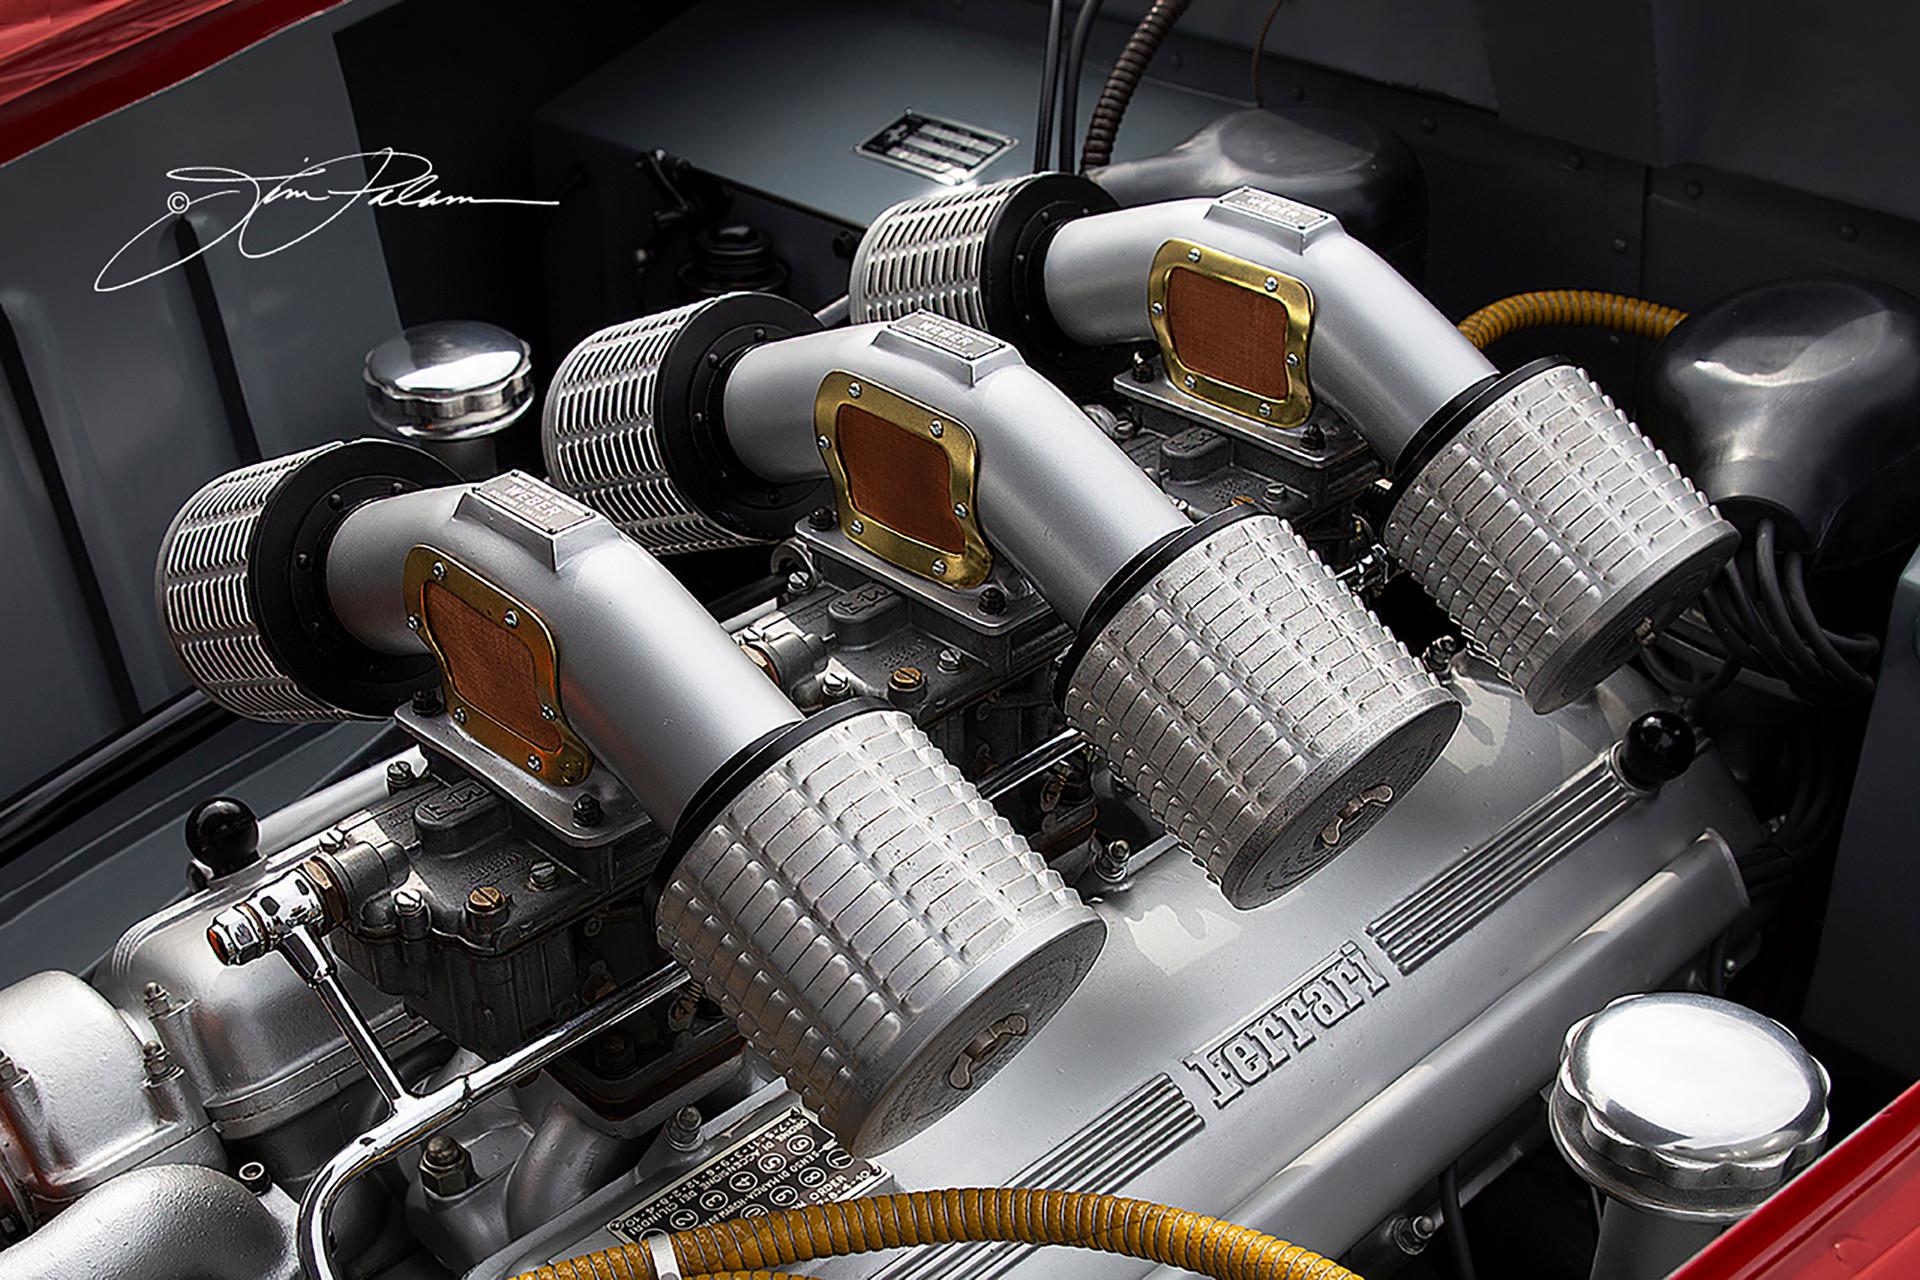 P8_66Ferrari_Motor_sig.jpg